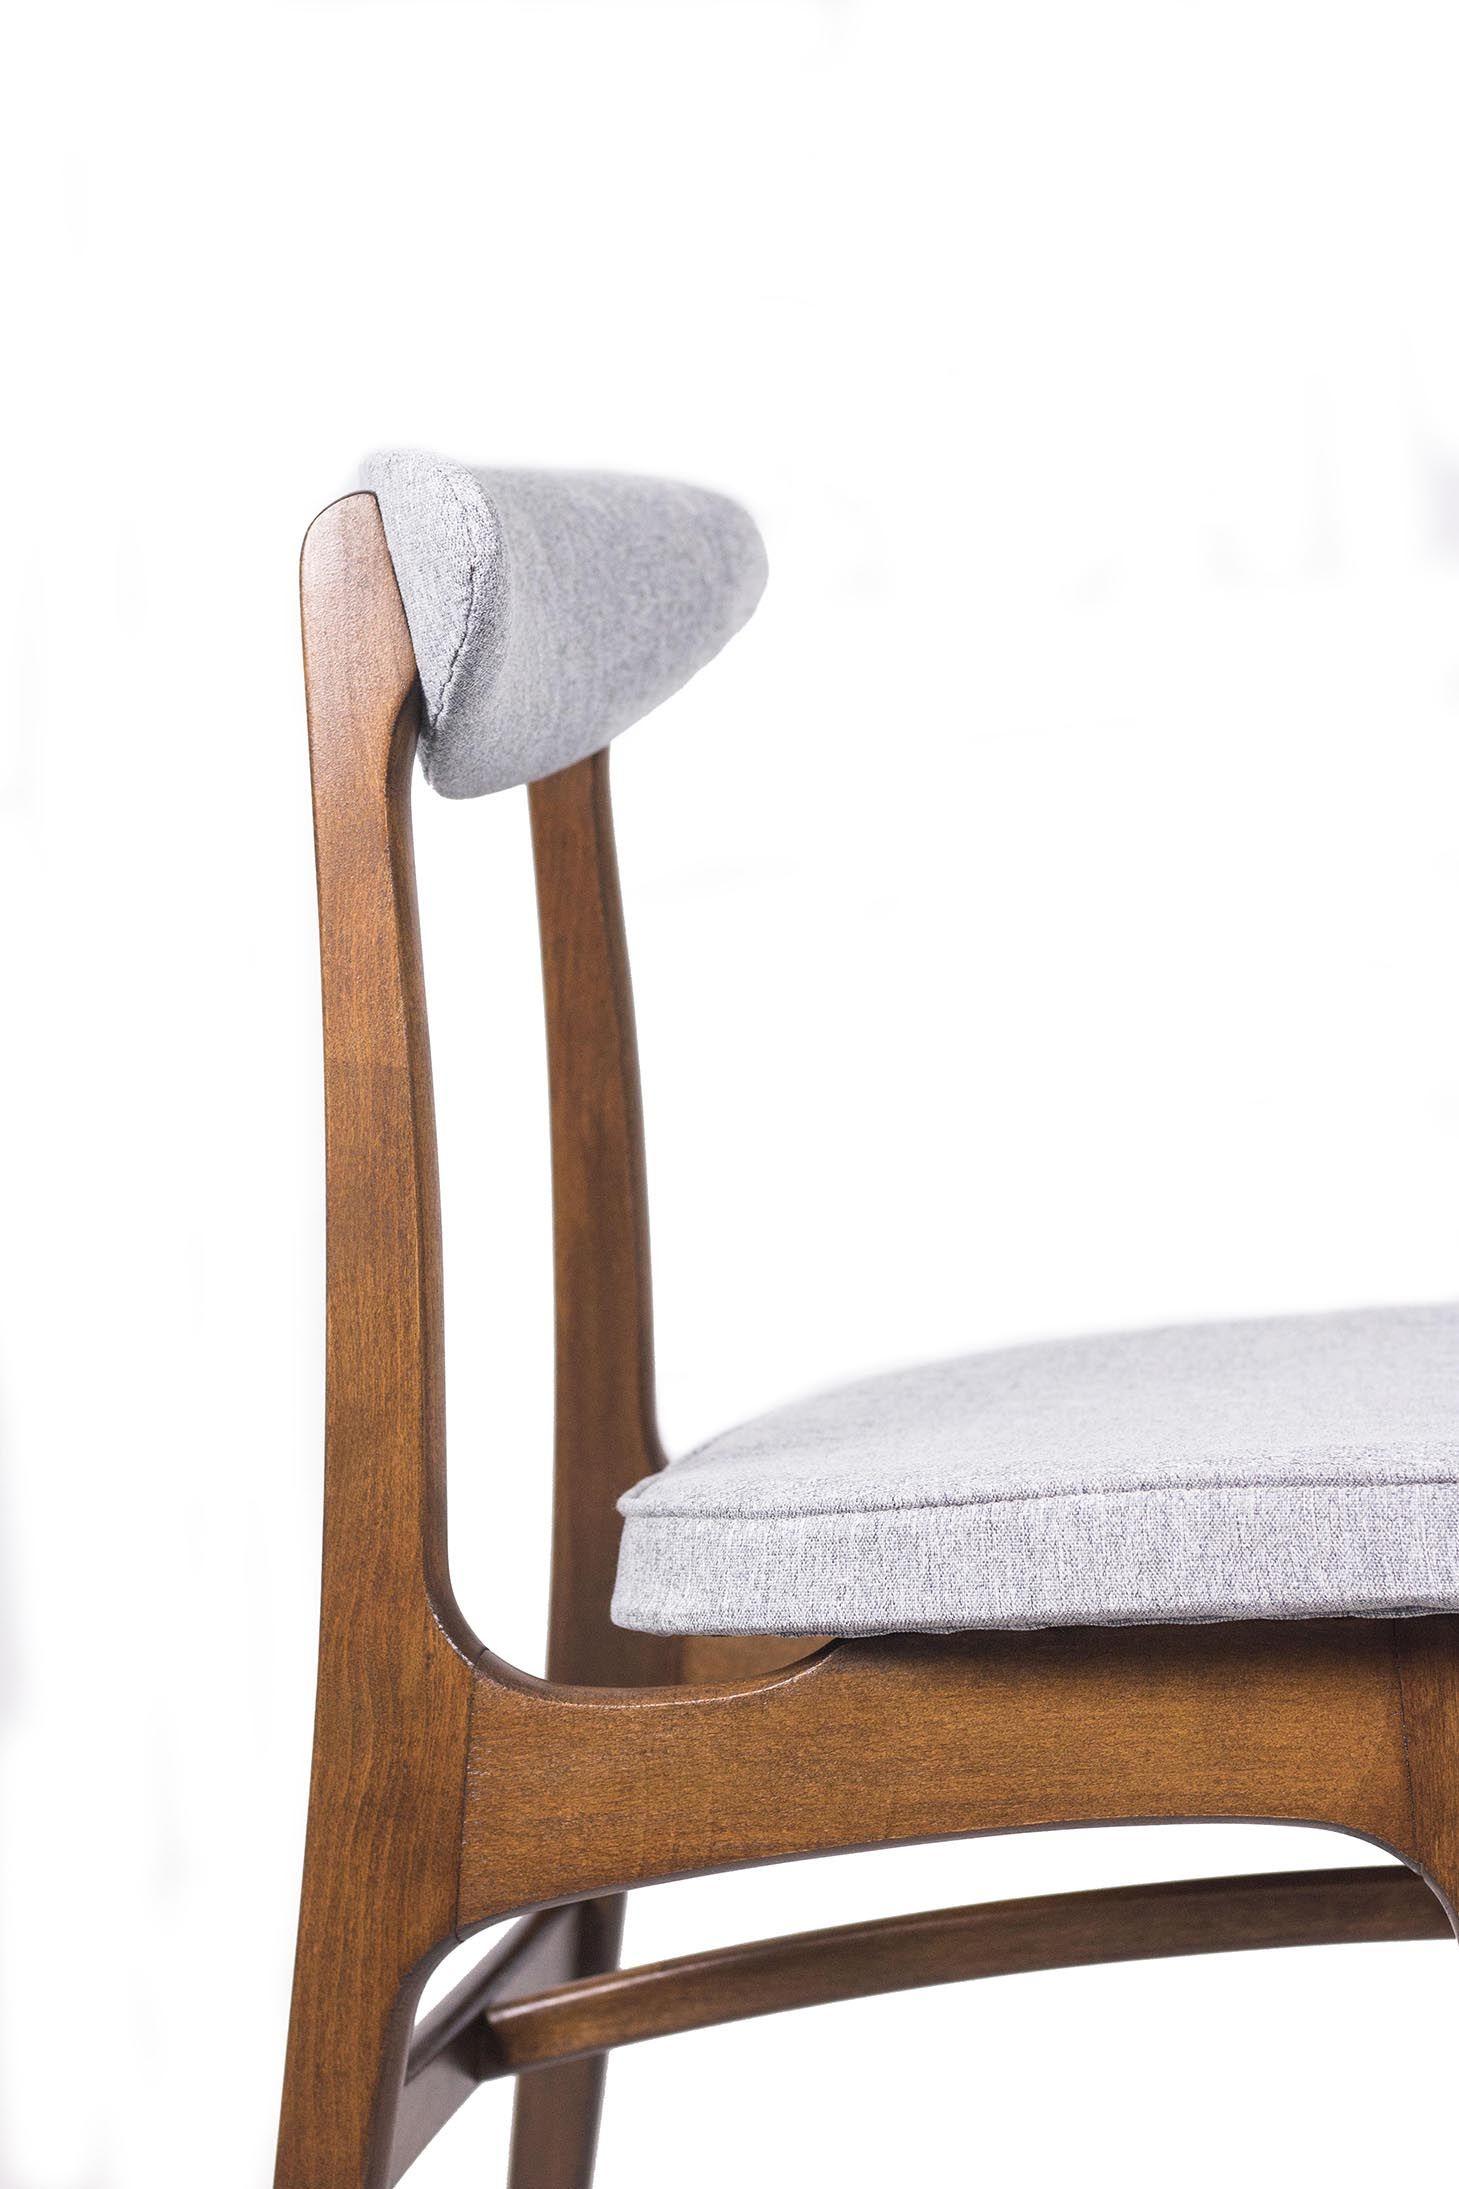 Krzes O Prl Proj Rajmund Ha As Typ 200 190 Lata 60 Chair  # Muebles Badiola